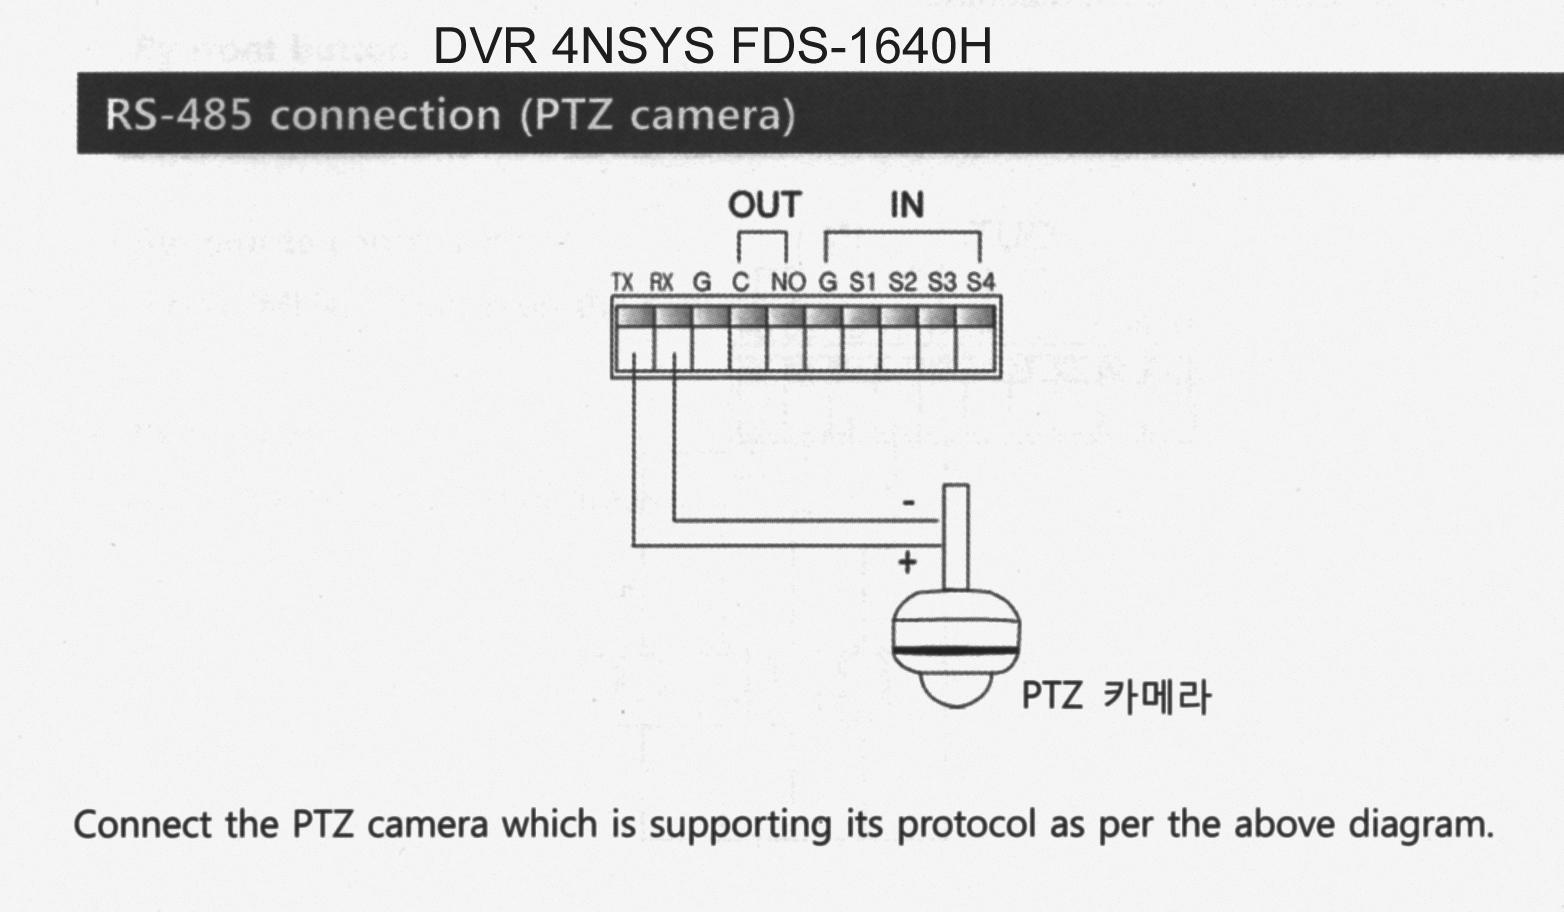 pelco rs485 ptz wiring diagram electronic schematics collectionspelco rs485 ptz wiring diagram superior quad hd full hd analogsiemens ccda1435 e cka4820 cctv forum